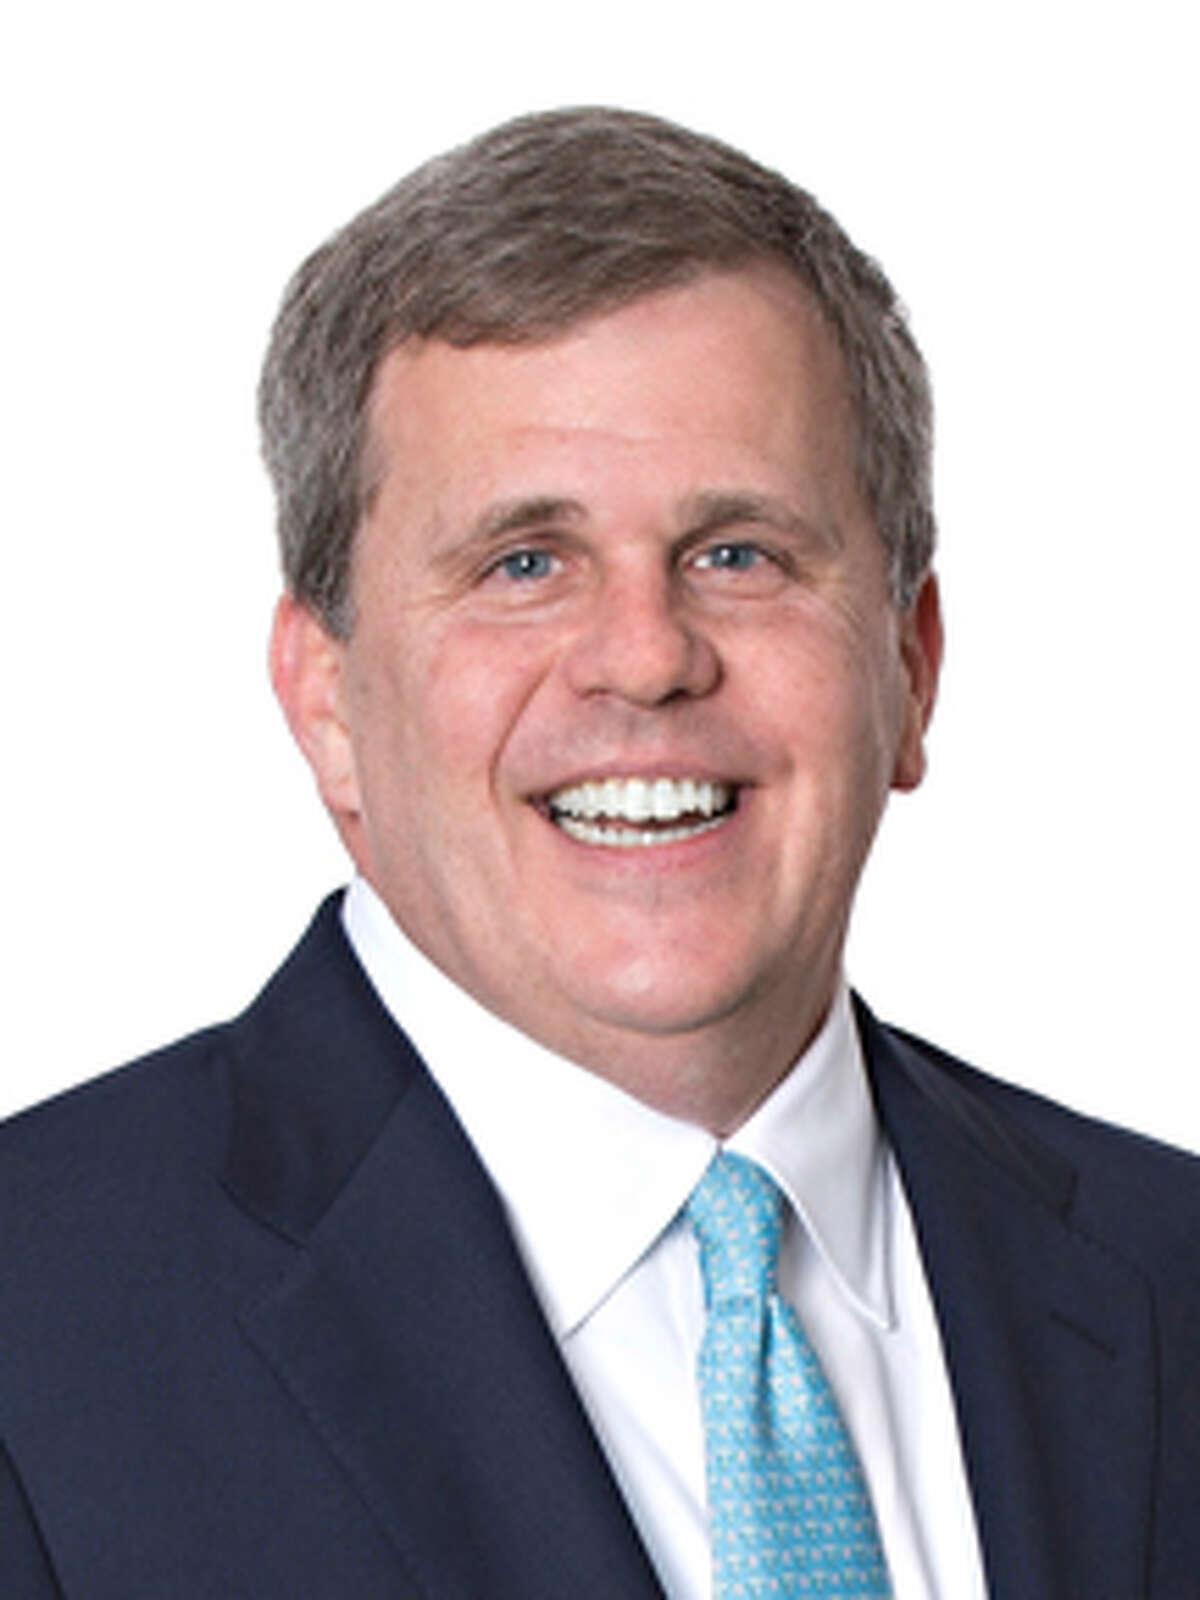 Douglas Yeager joins Winston & Strawn's Houston office